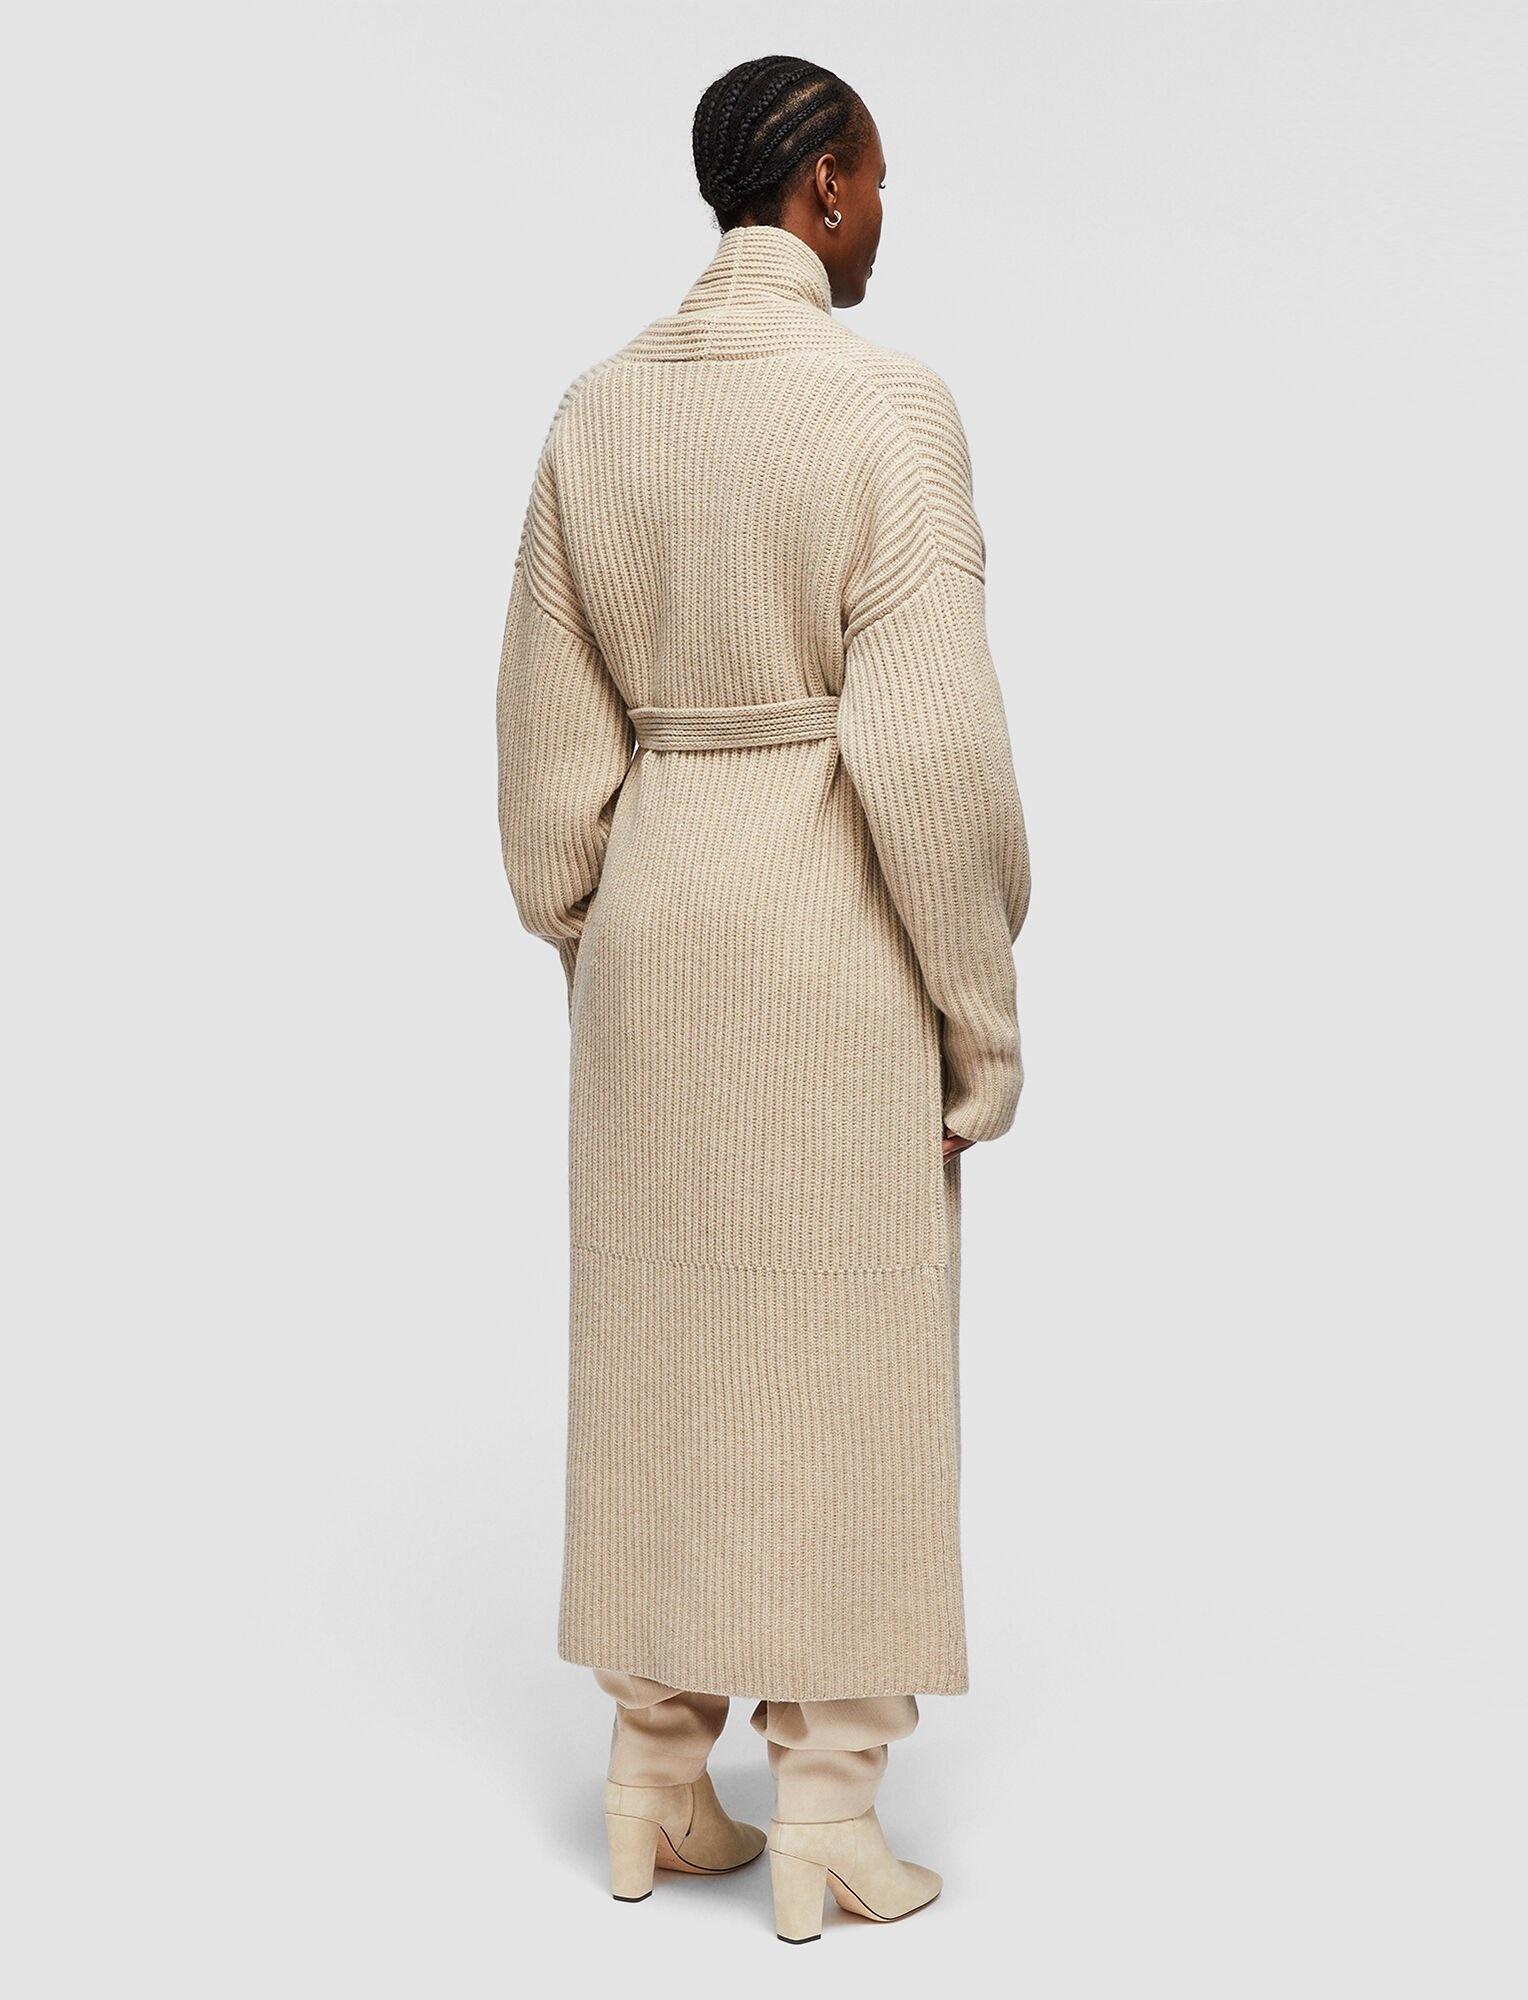 Coat Cardigan Stitch Sandshell